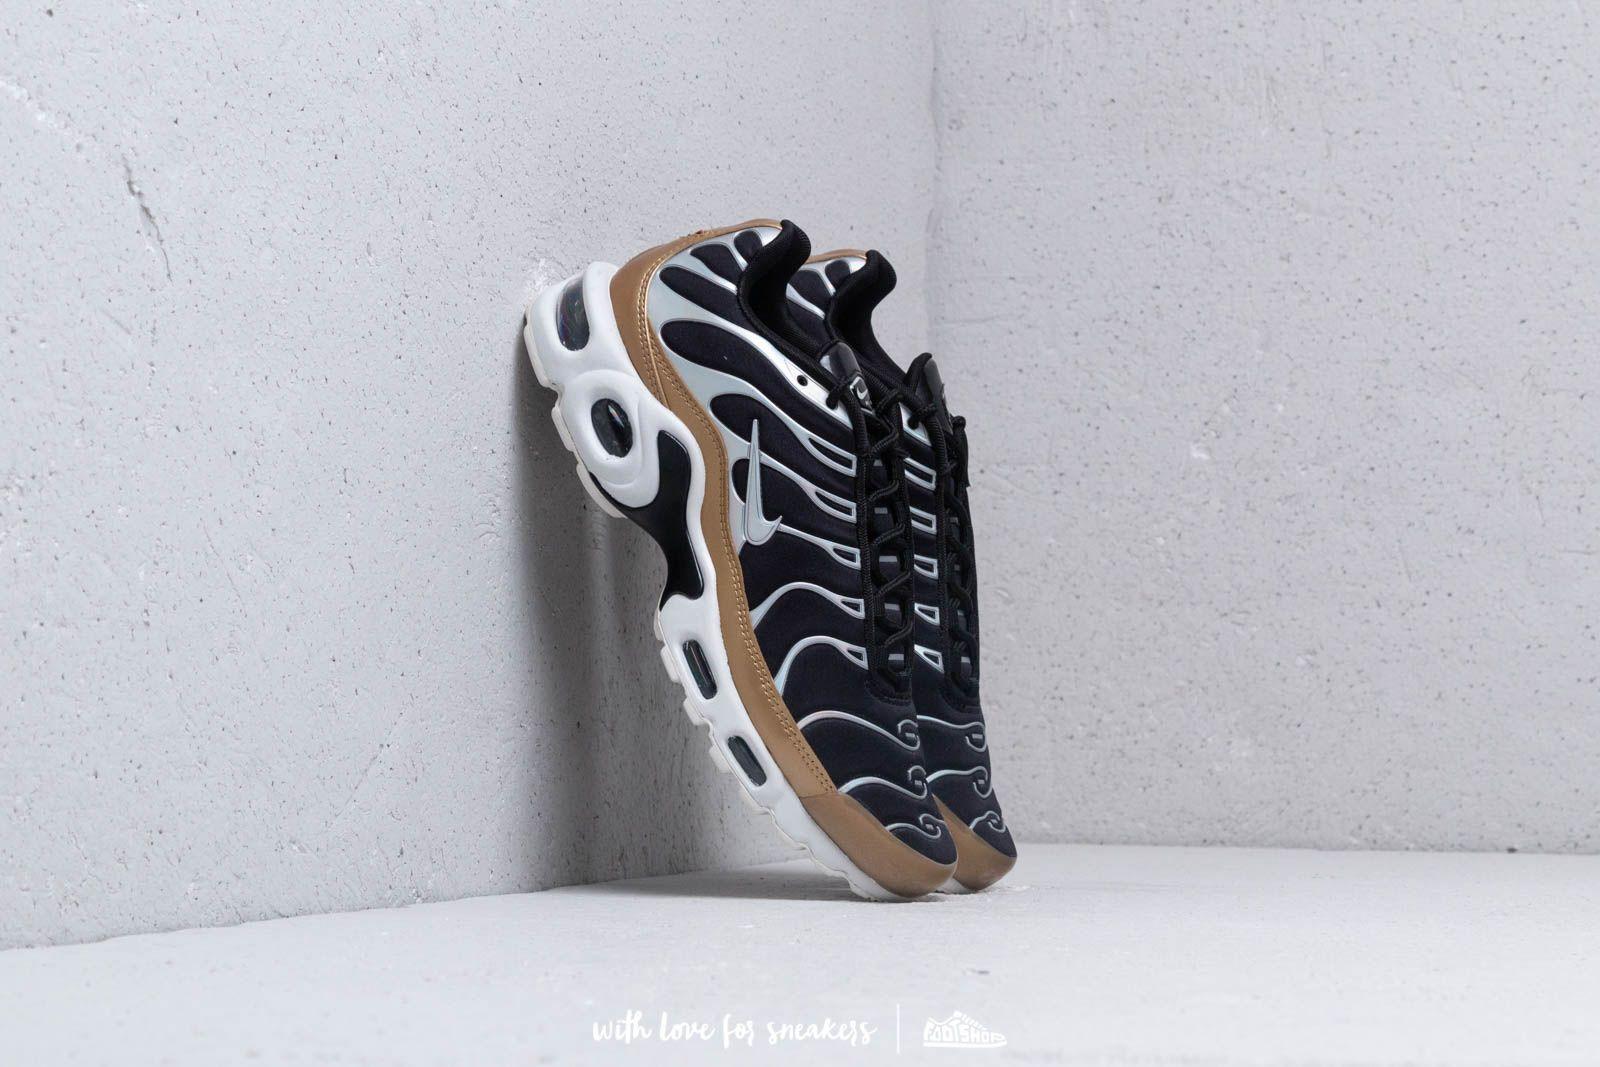 Dámské tenisky a boty Nike Air Max Plus Wmns Black/ Aluminium-White-Aluminium